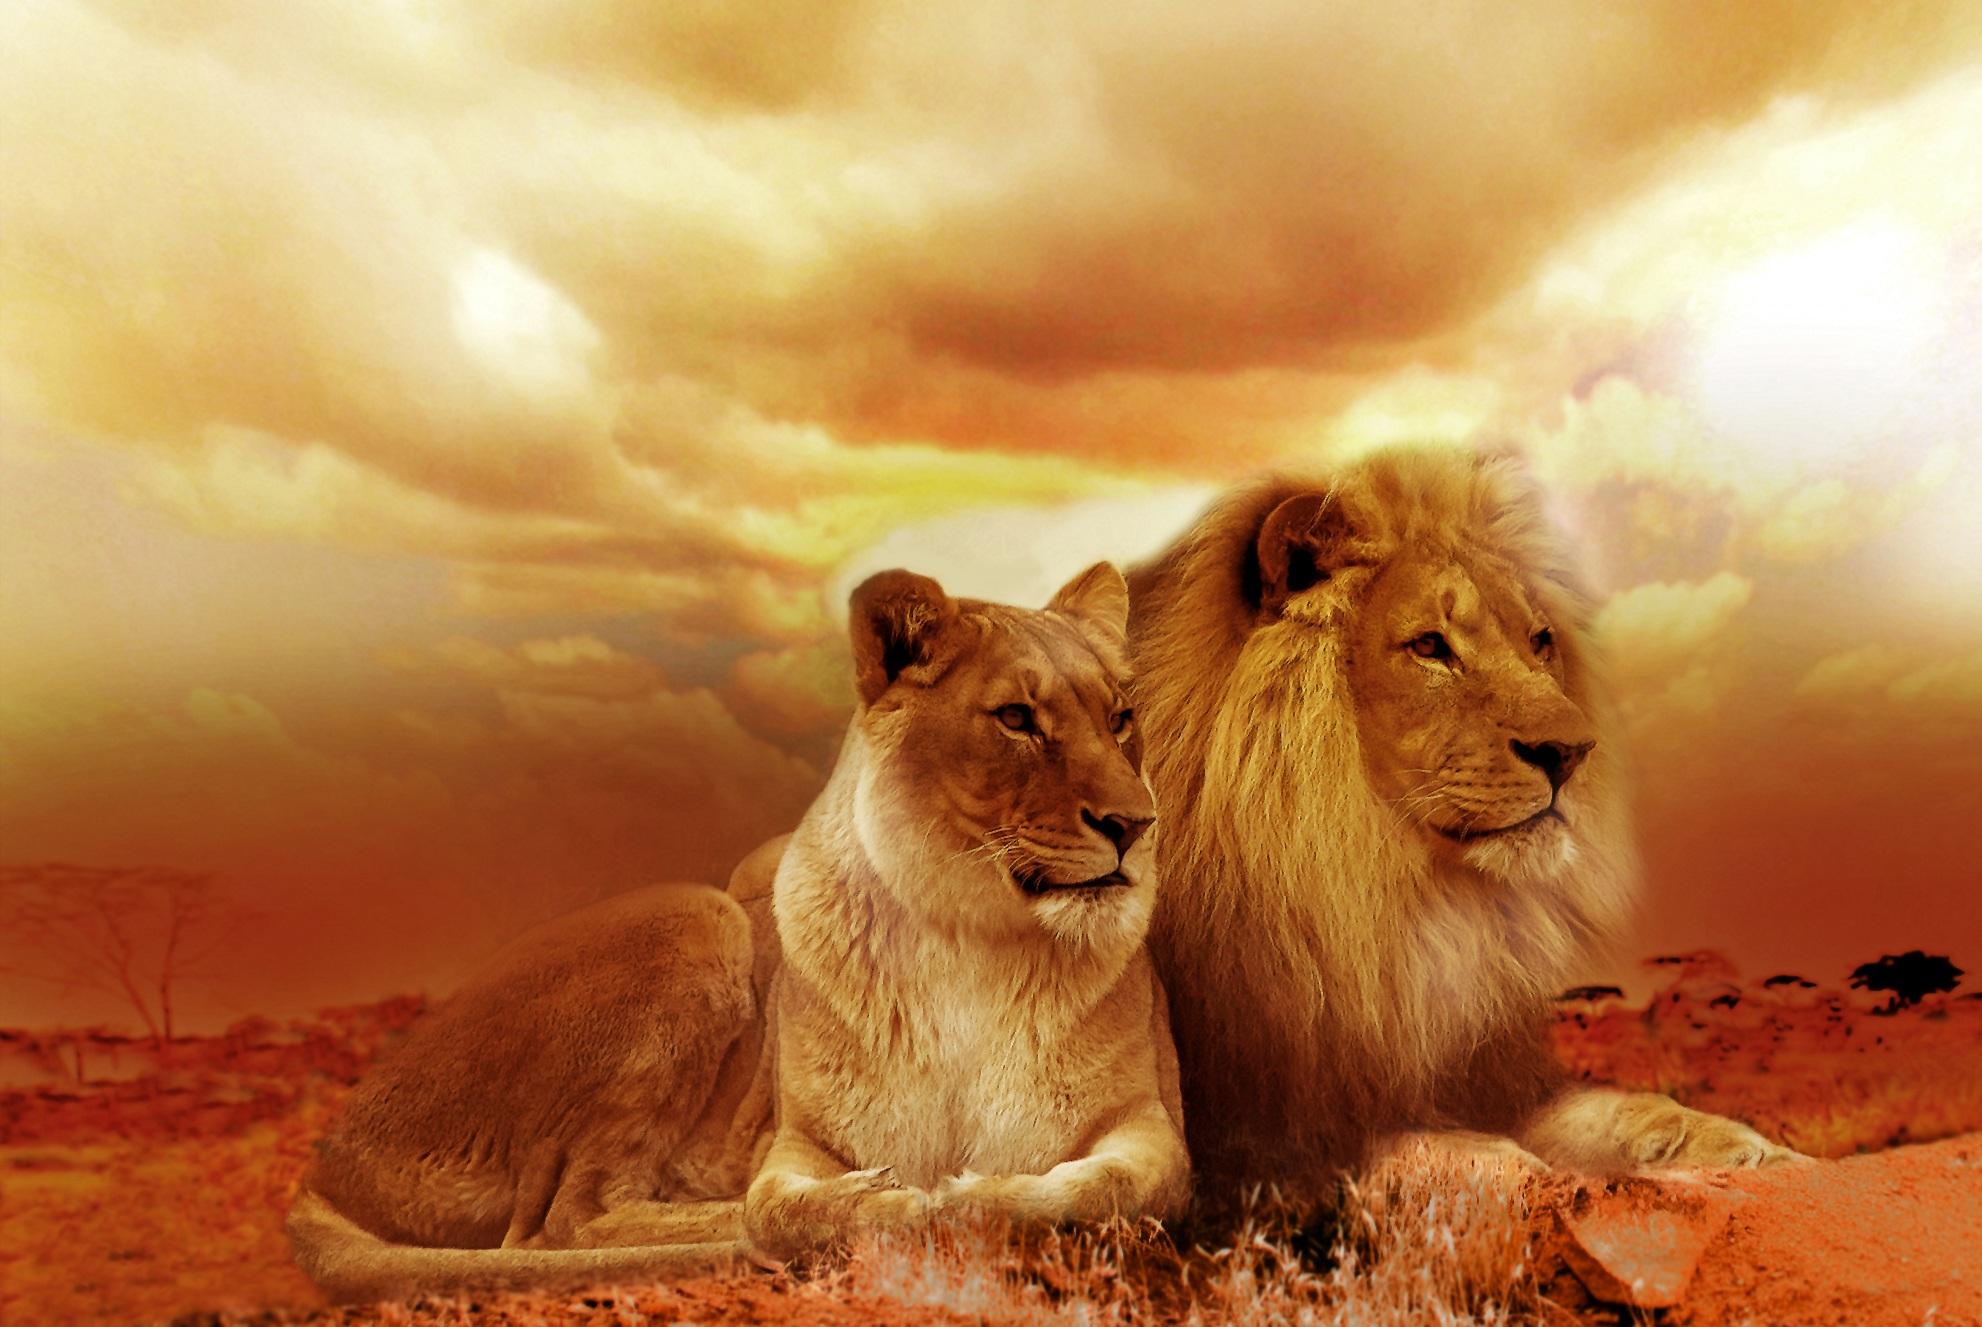 free stock photos of lion pexels